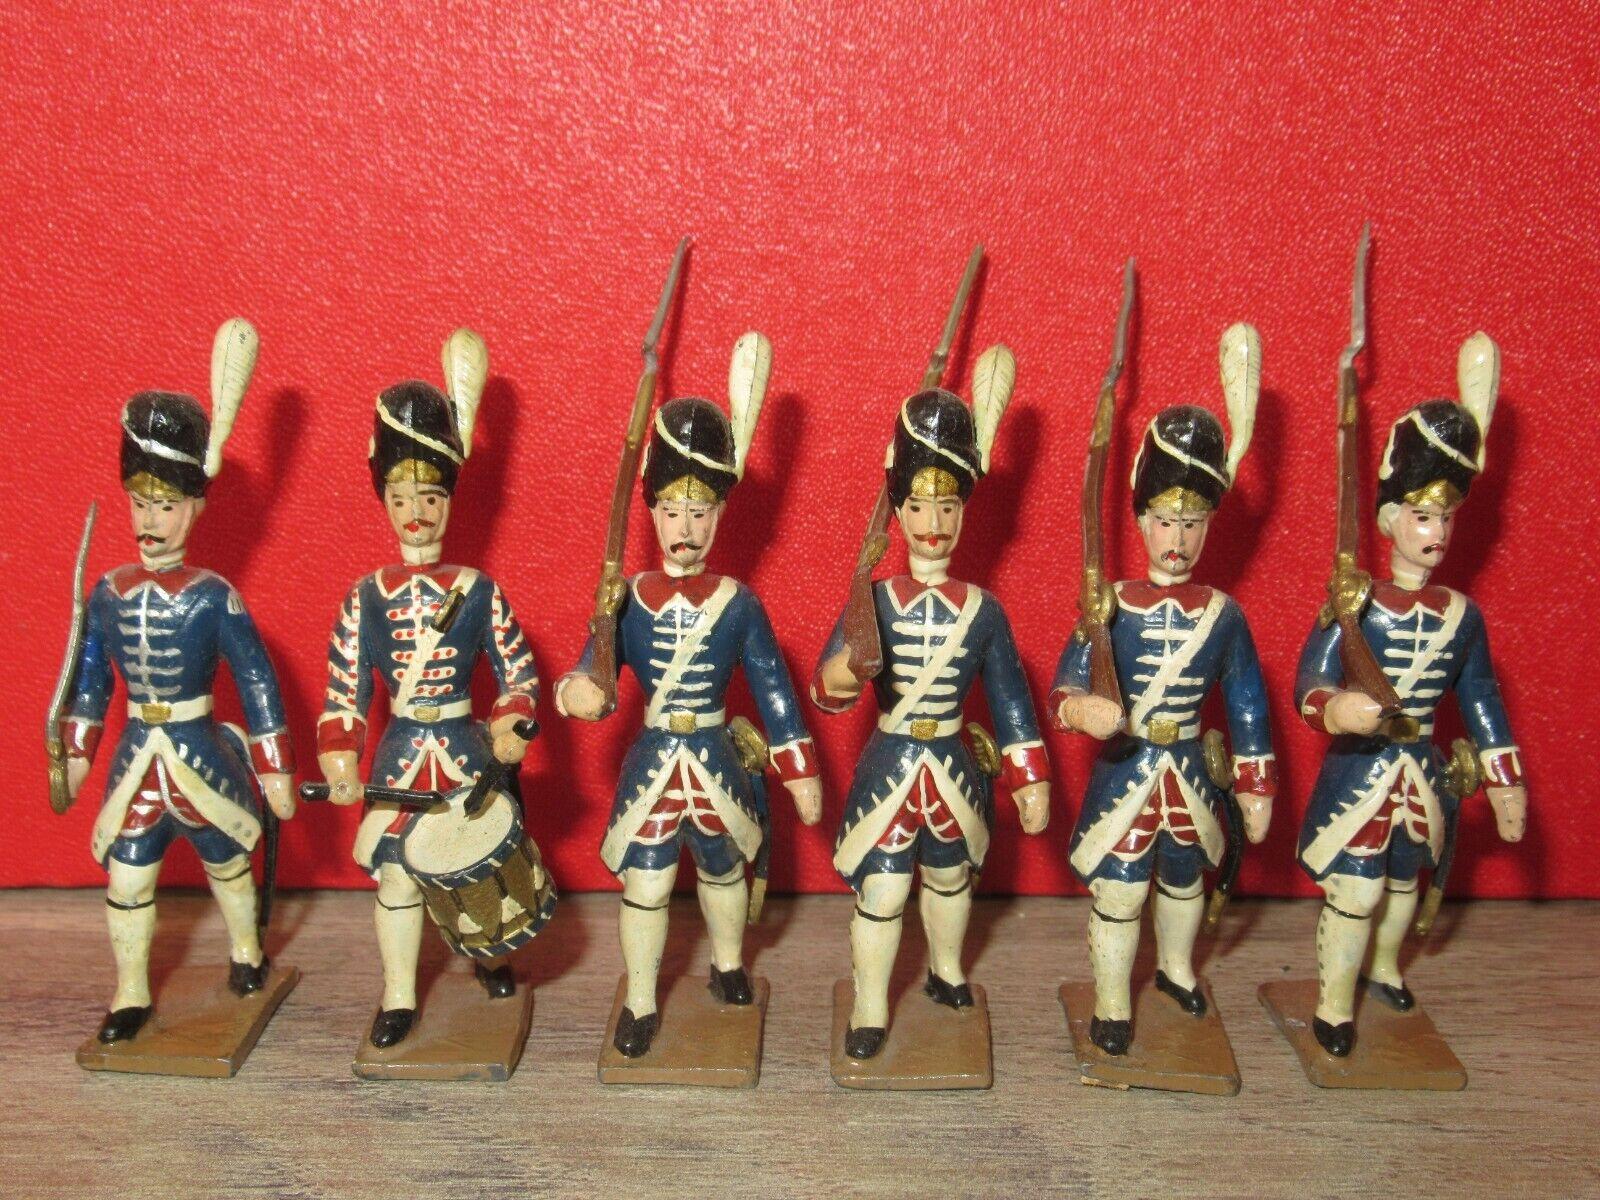 CBG mignot ancien - 6 granatiers de la garde francaise de l ancien regime